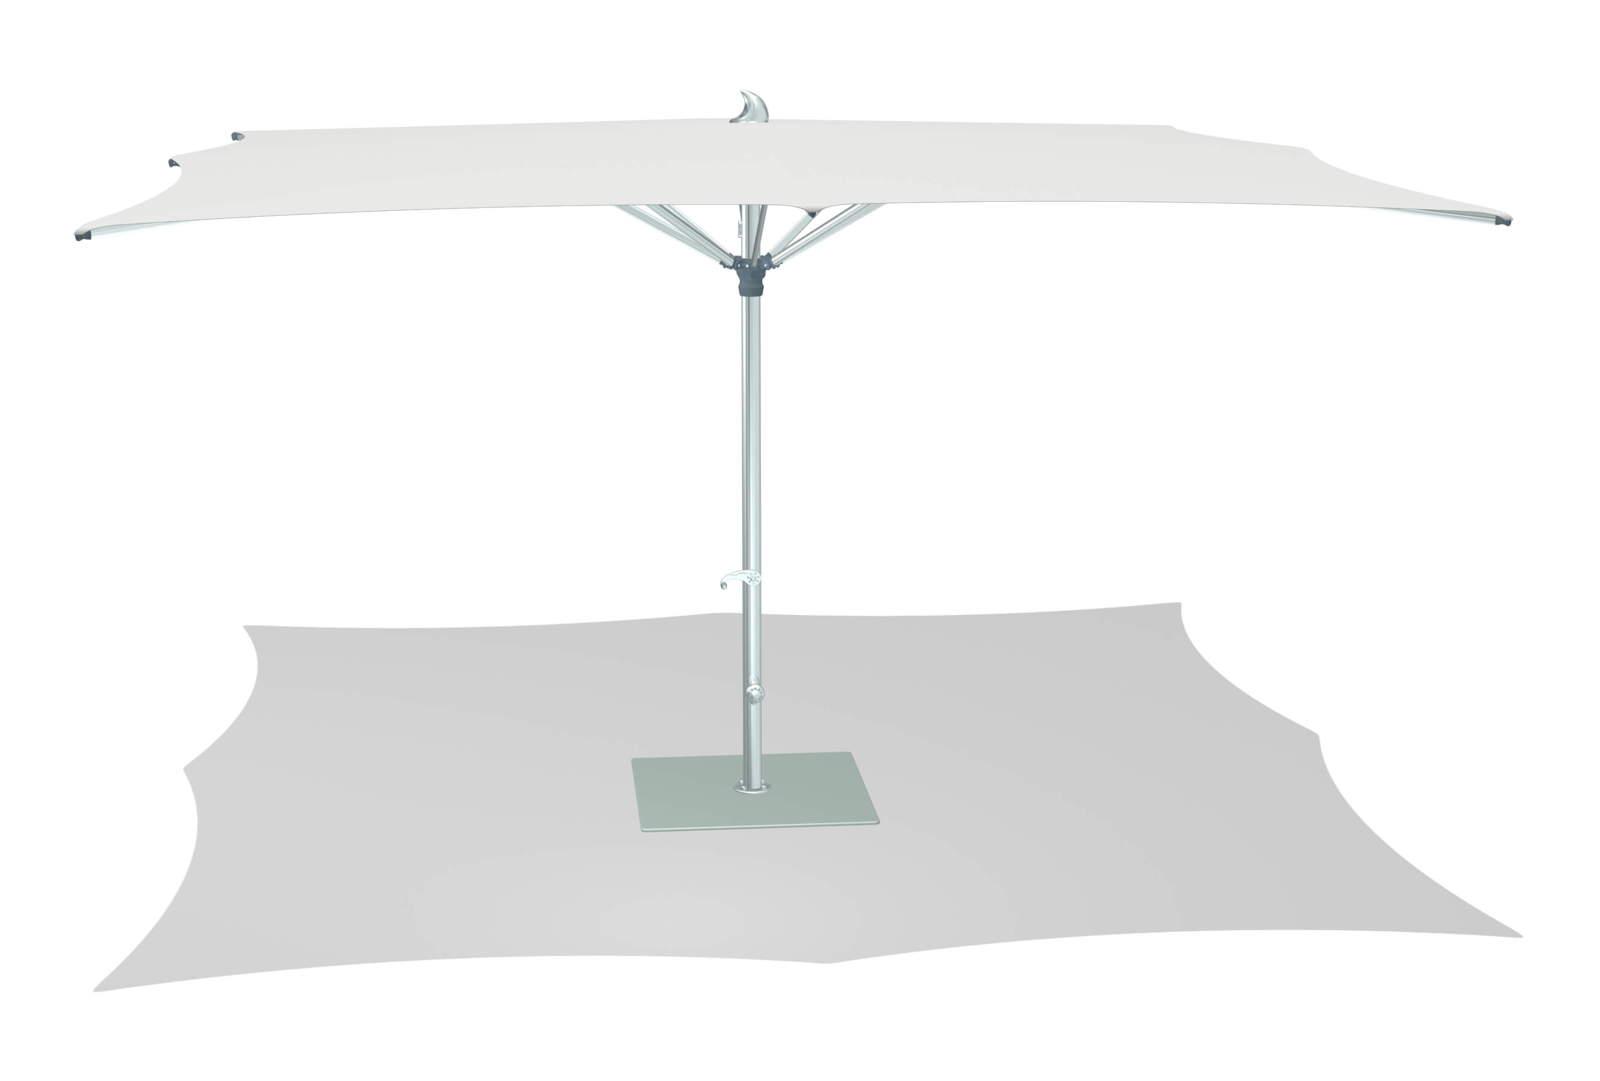 Sonnenschirm TUUCI Ocean Master MAX Zero Horizon 425cm natur Sonnenschutz